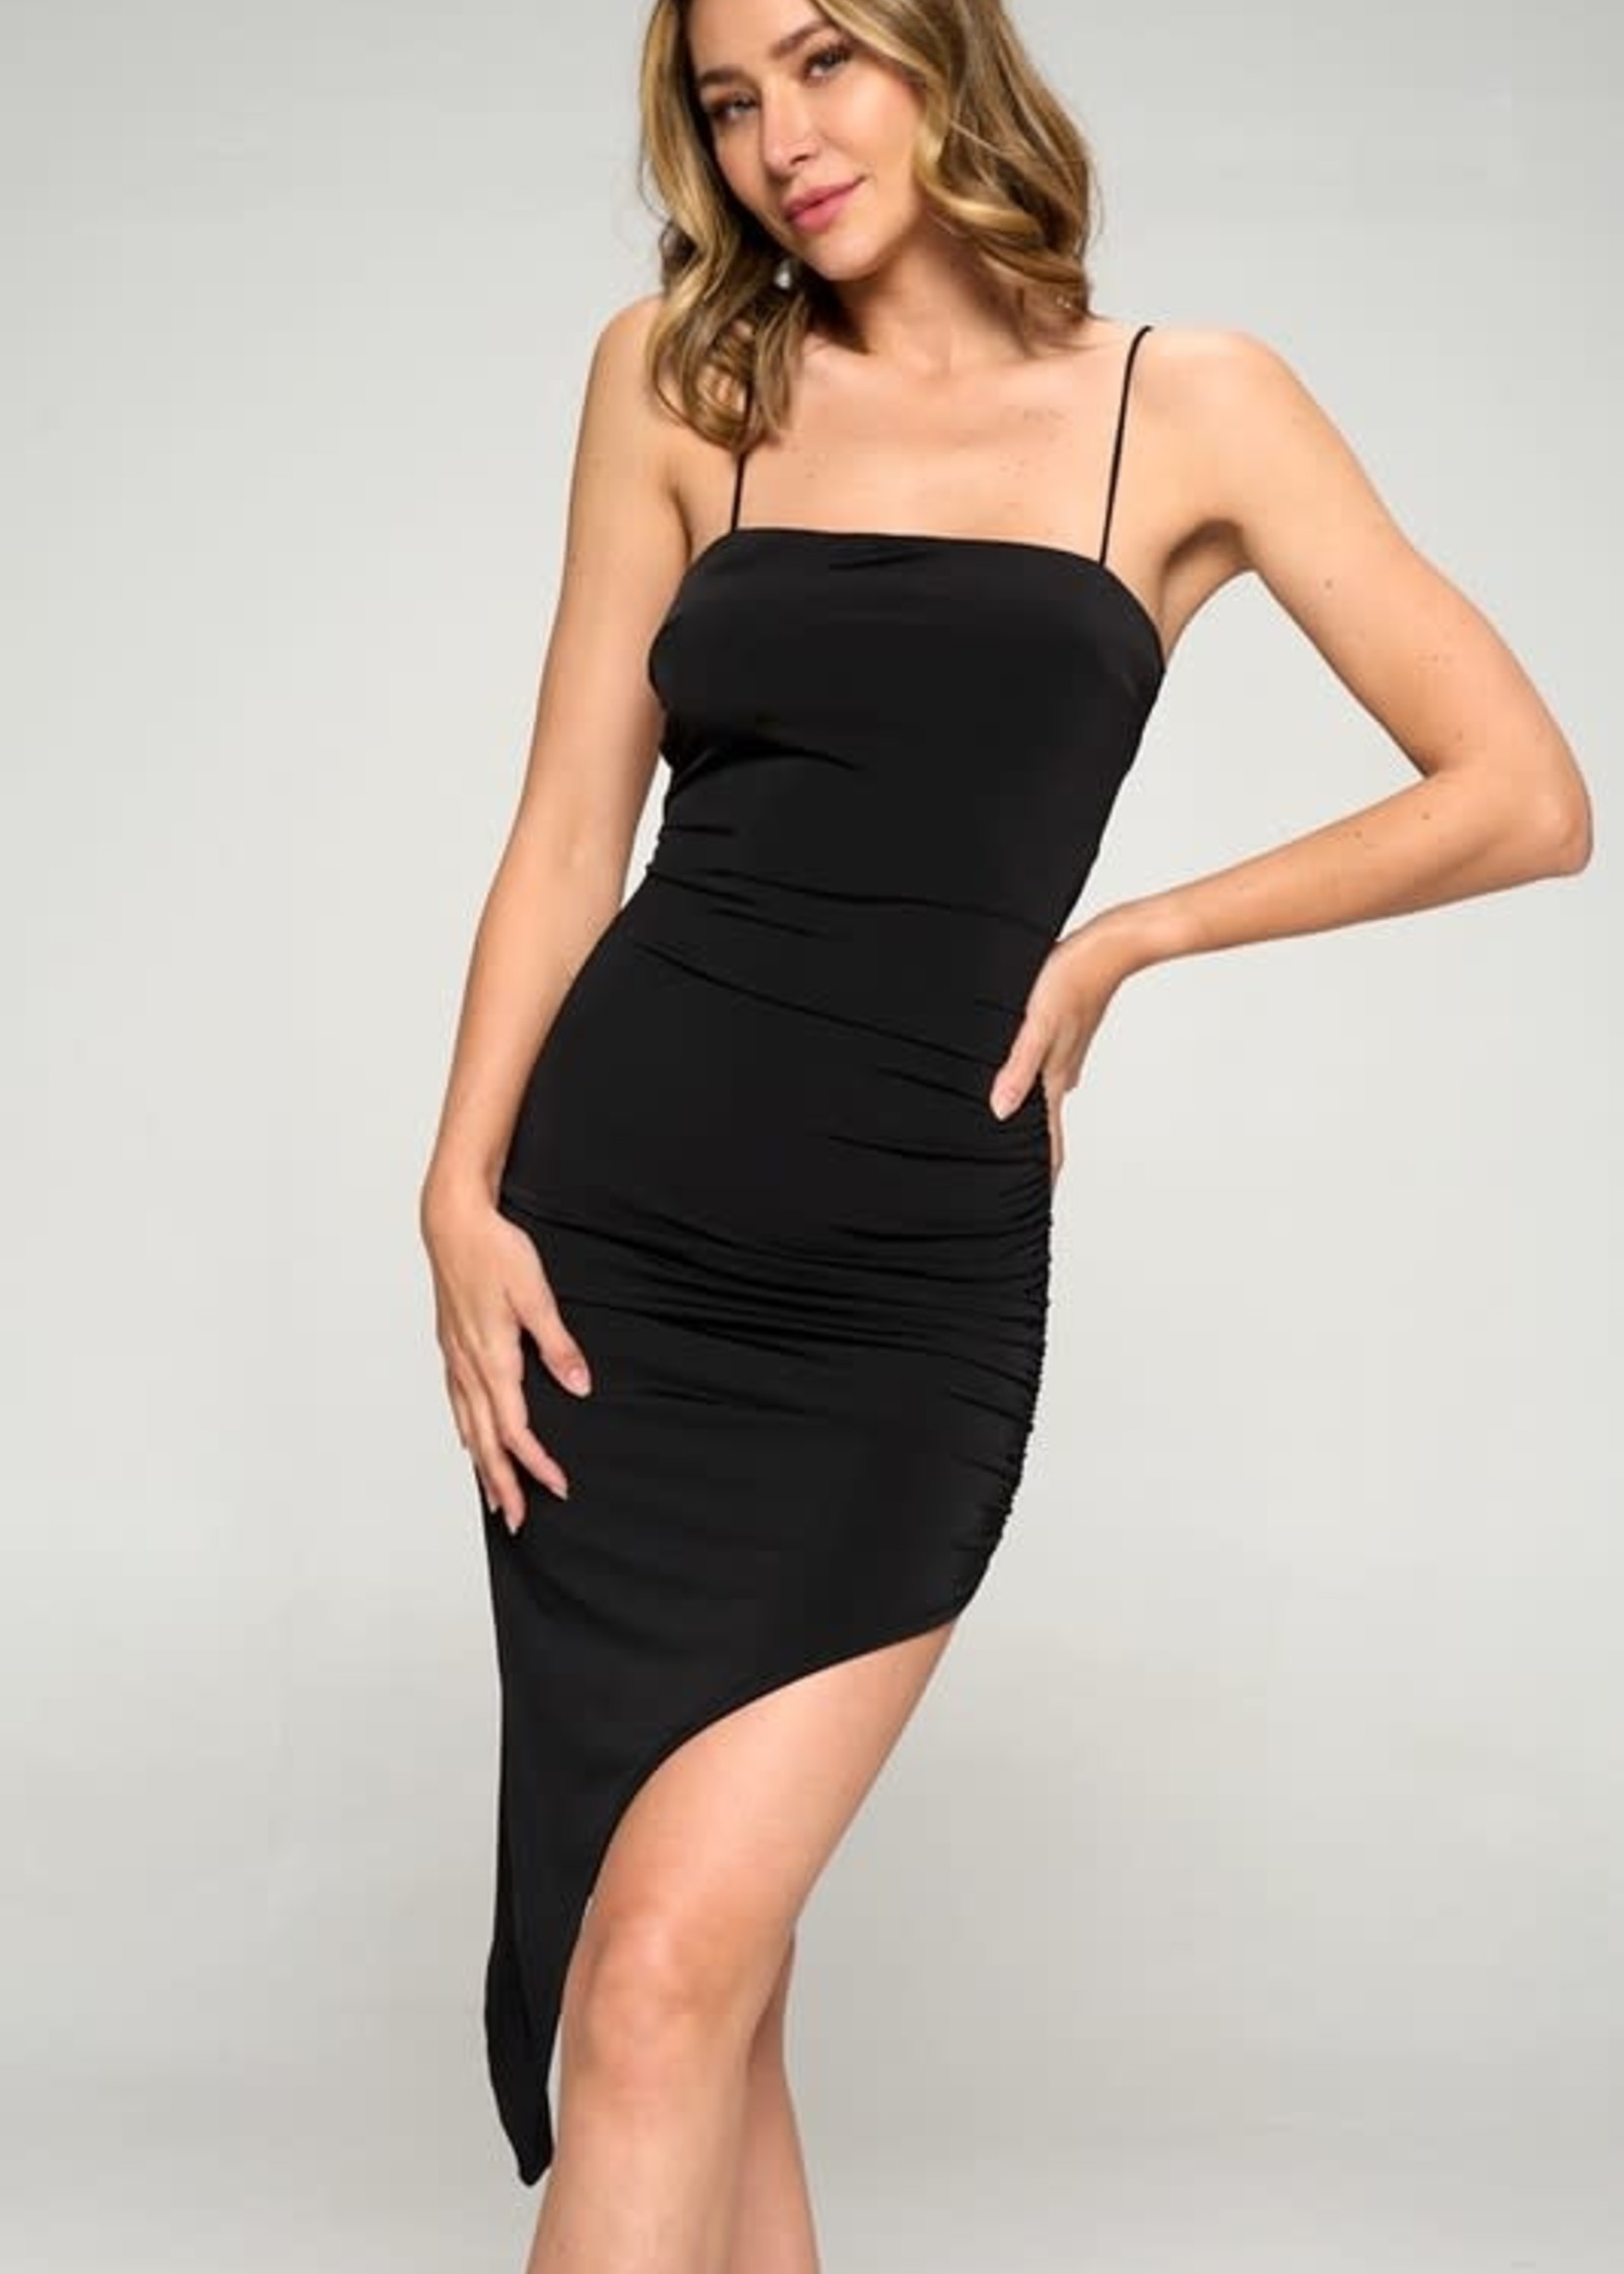 Celebrate This Moment Black Dress